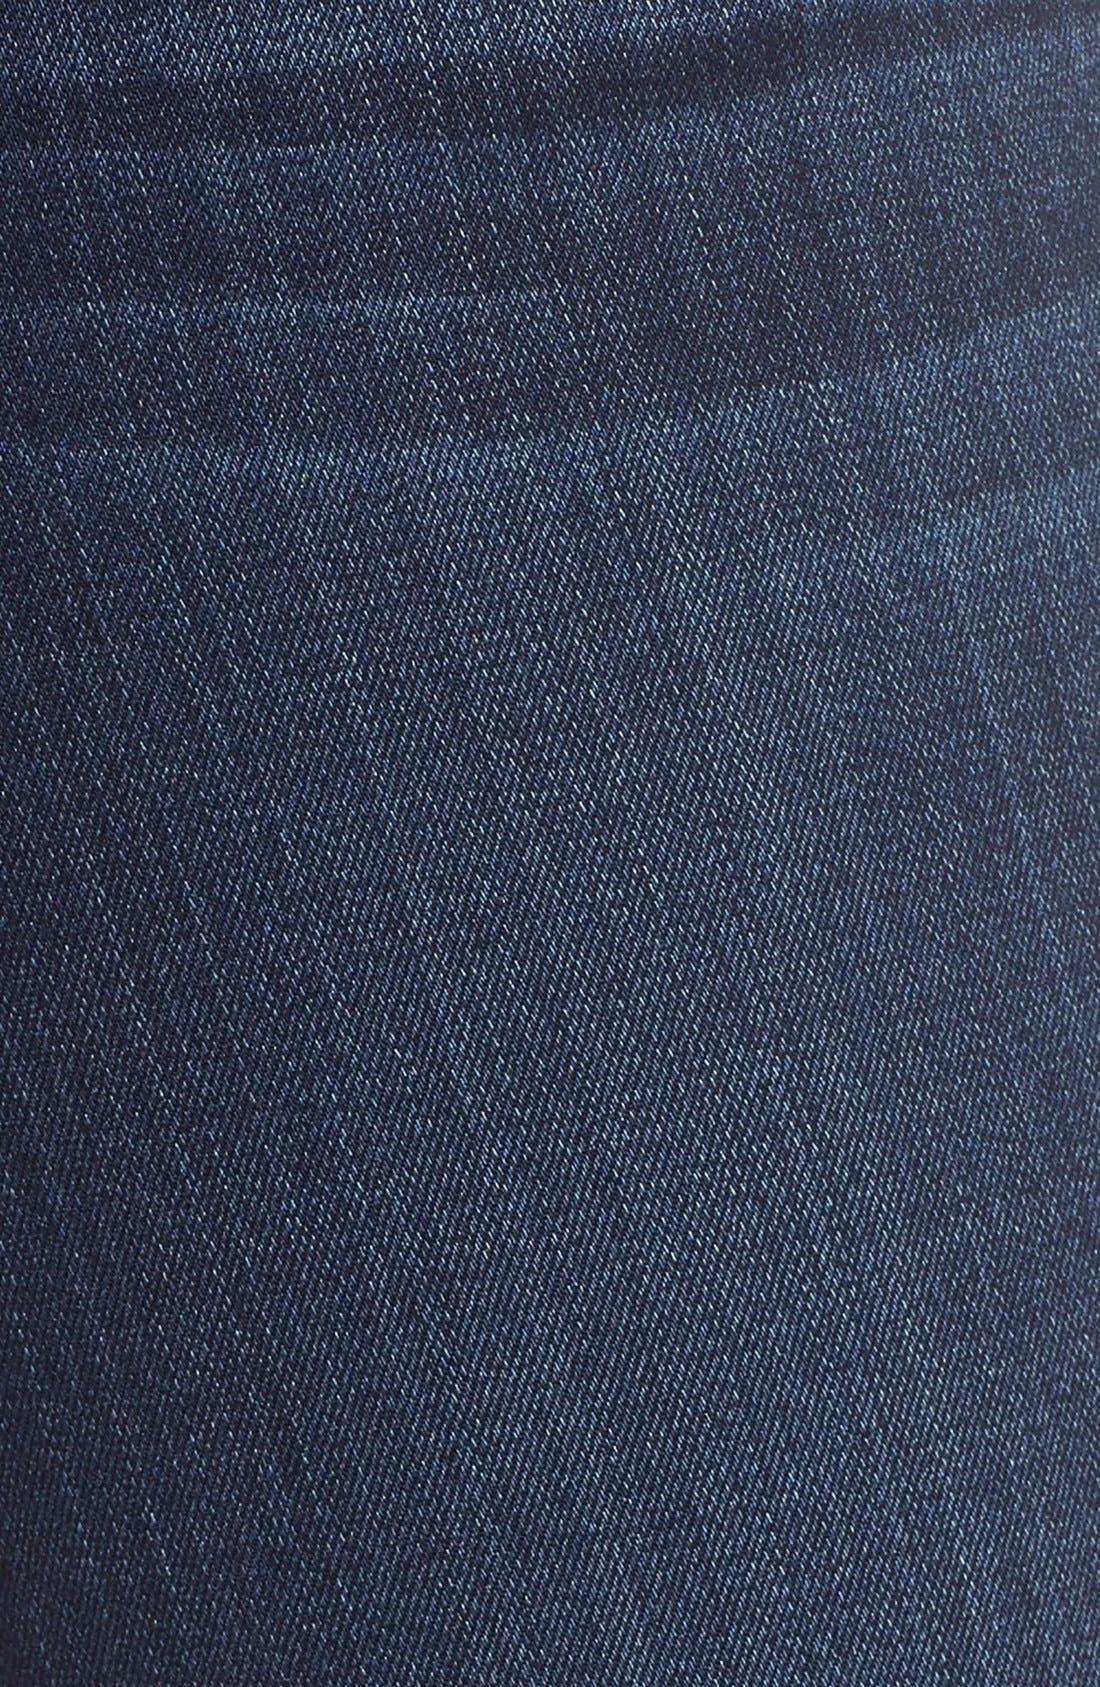 Transcend - Hoxton High Waist Ankle Ultra Skinny Jeans,                             Alternate thumbnail 3, color,                             HARTMANN